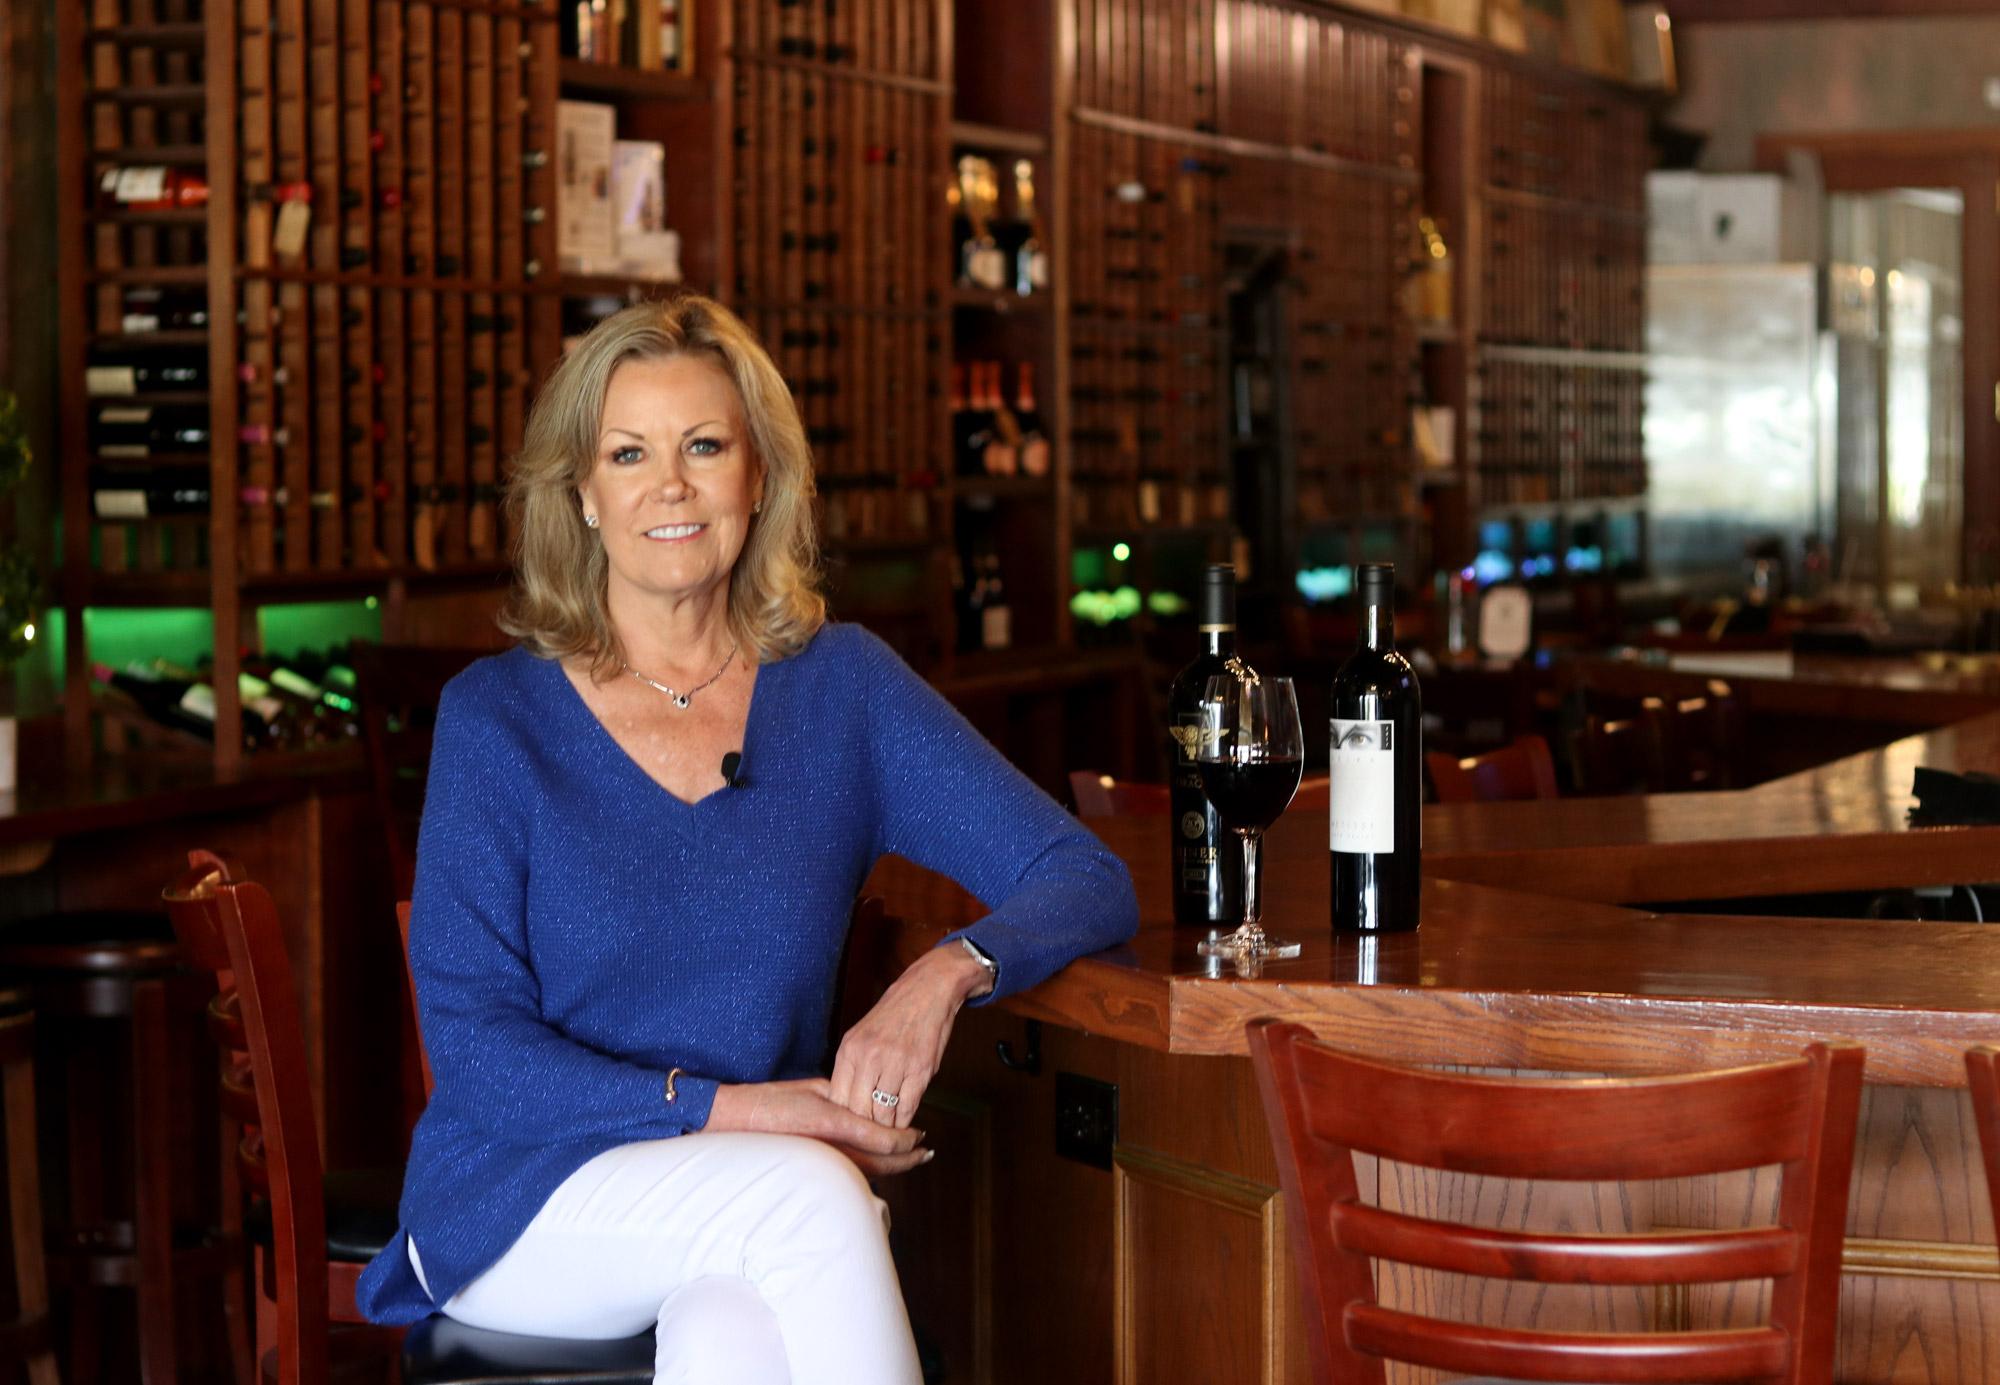 Deb Linden, Owner of The Vineyard Orlando